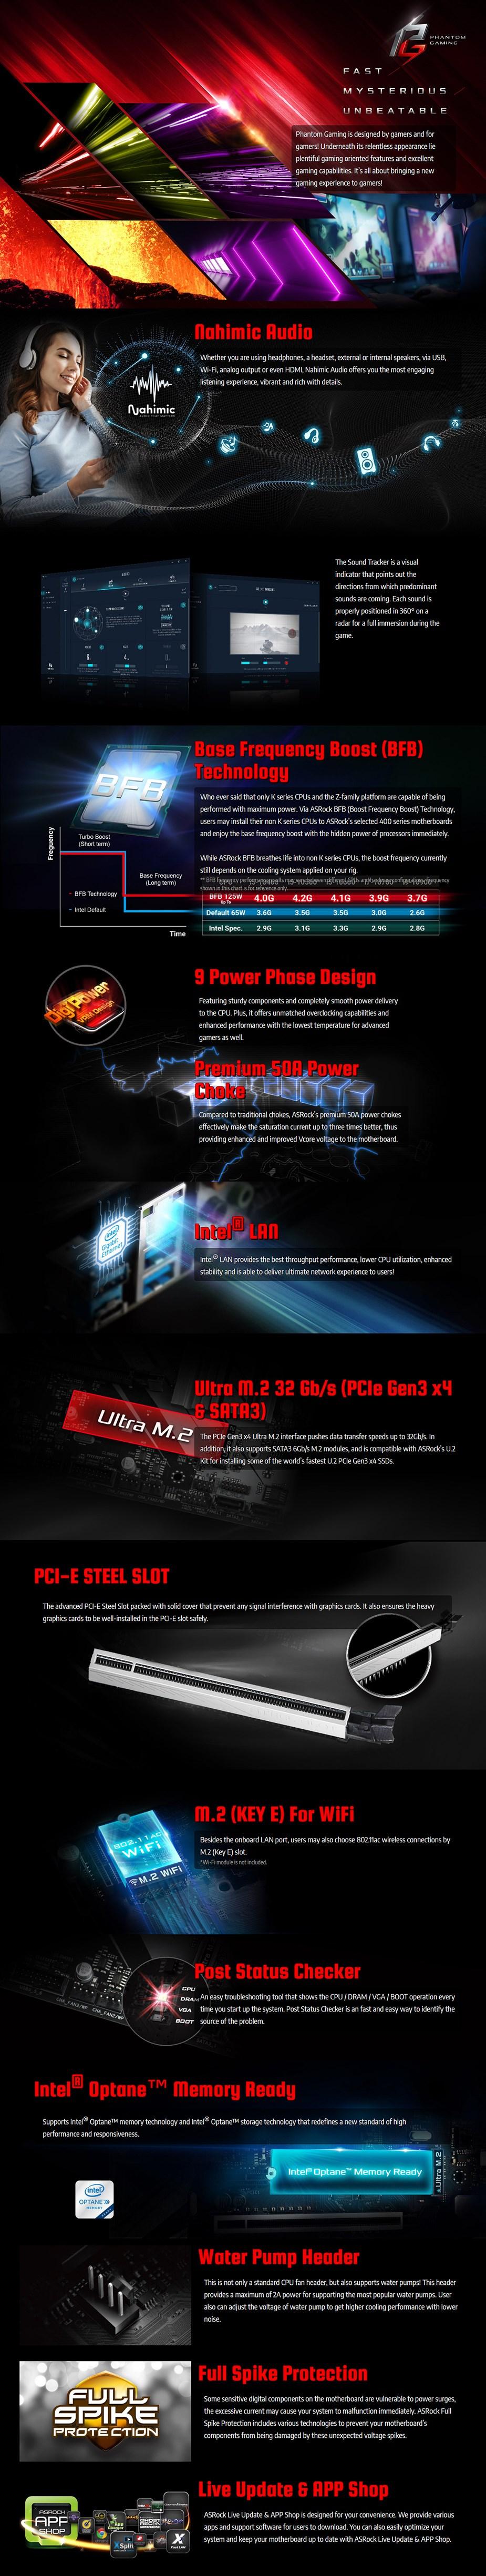 asrock-b460-phantom-gaming-4-lga-1200-atx-motherboard-ac35481-8.jpg